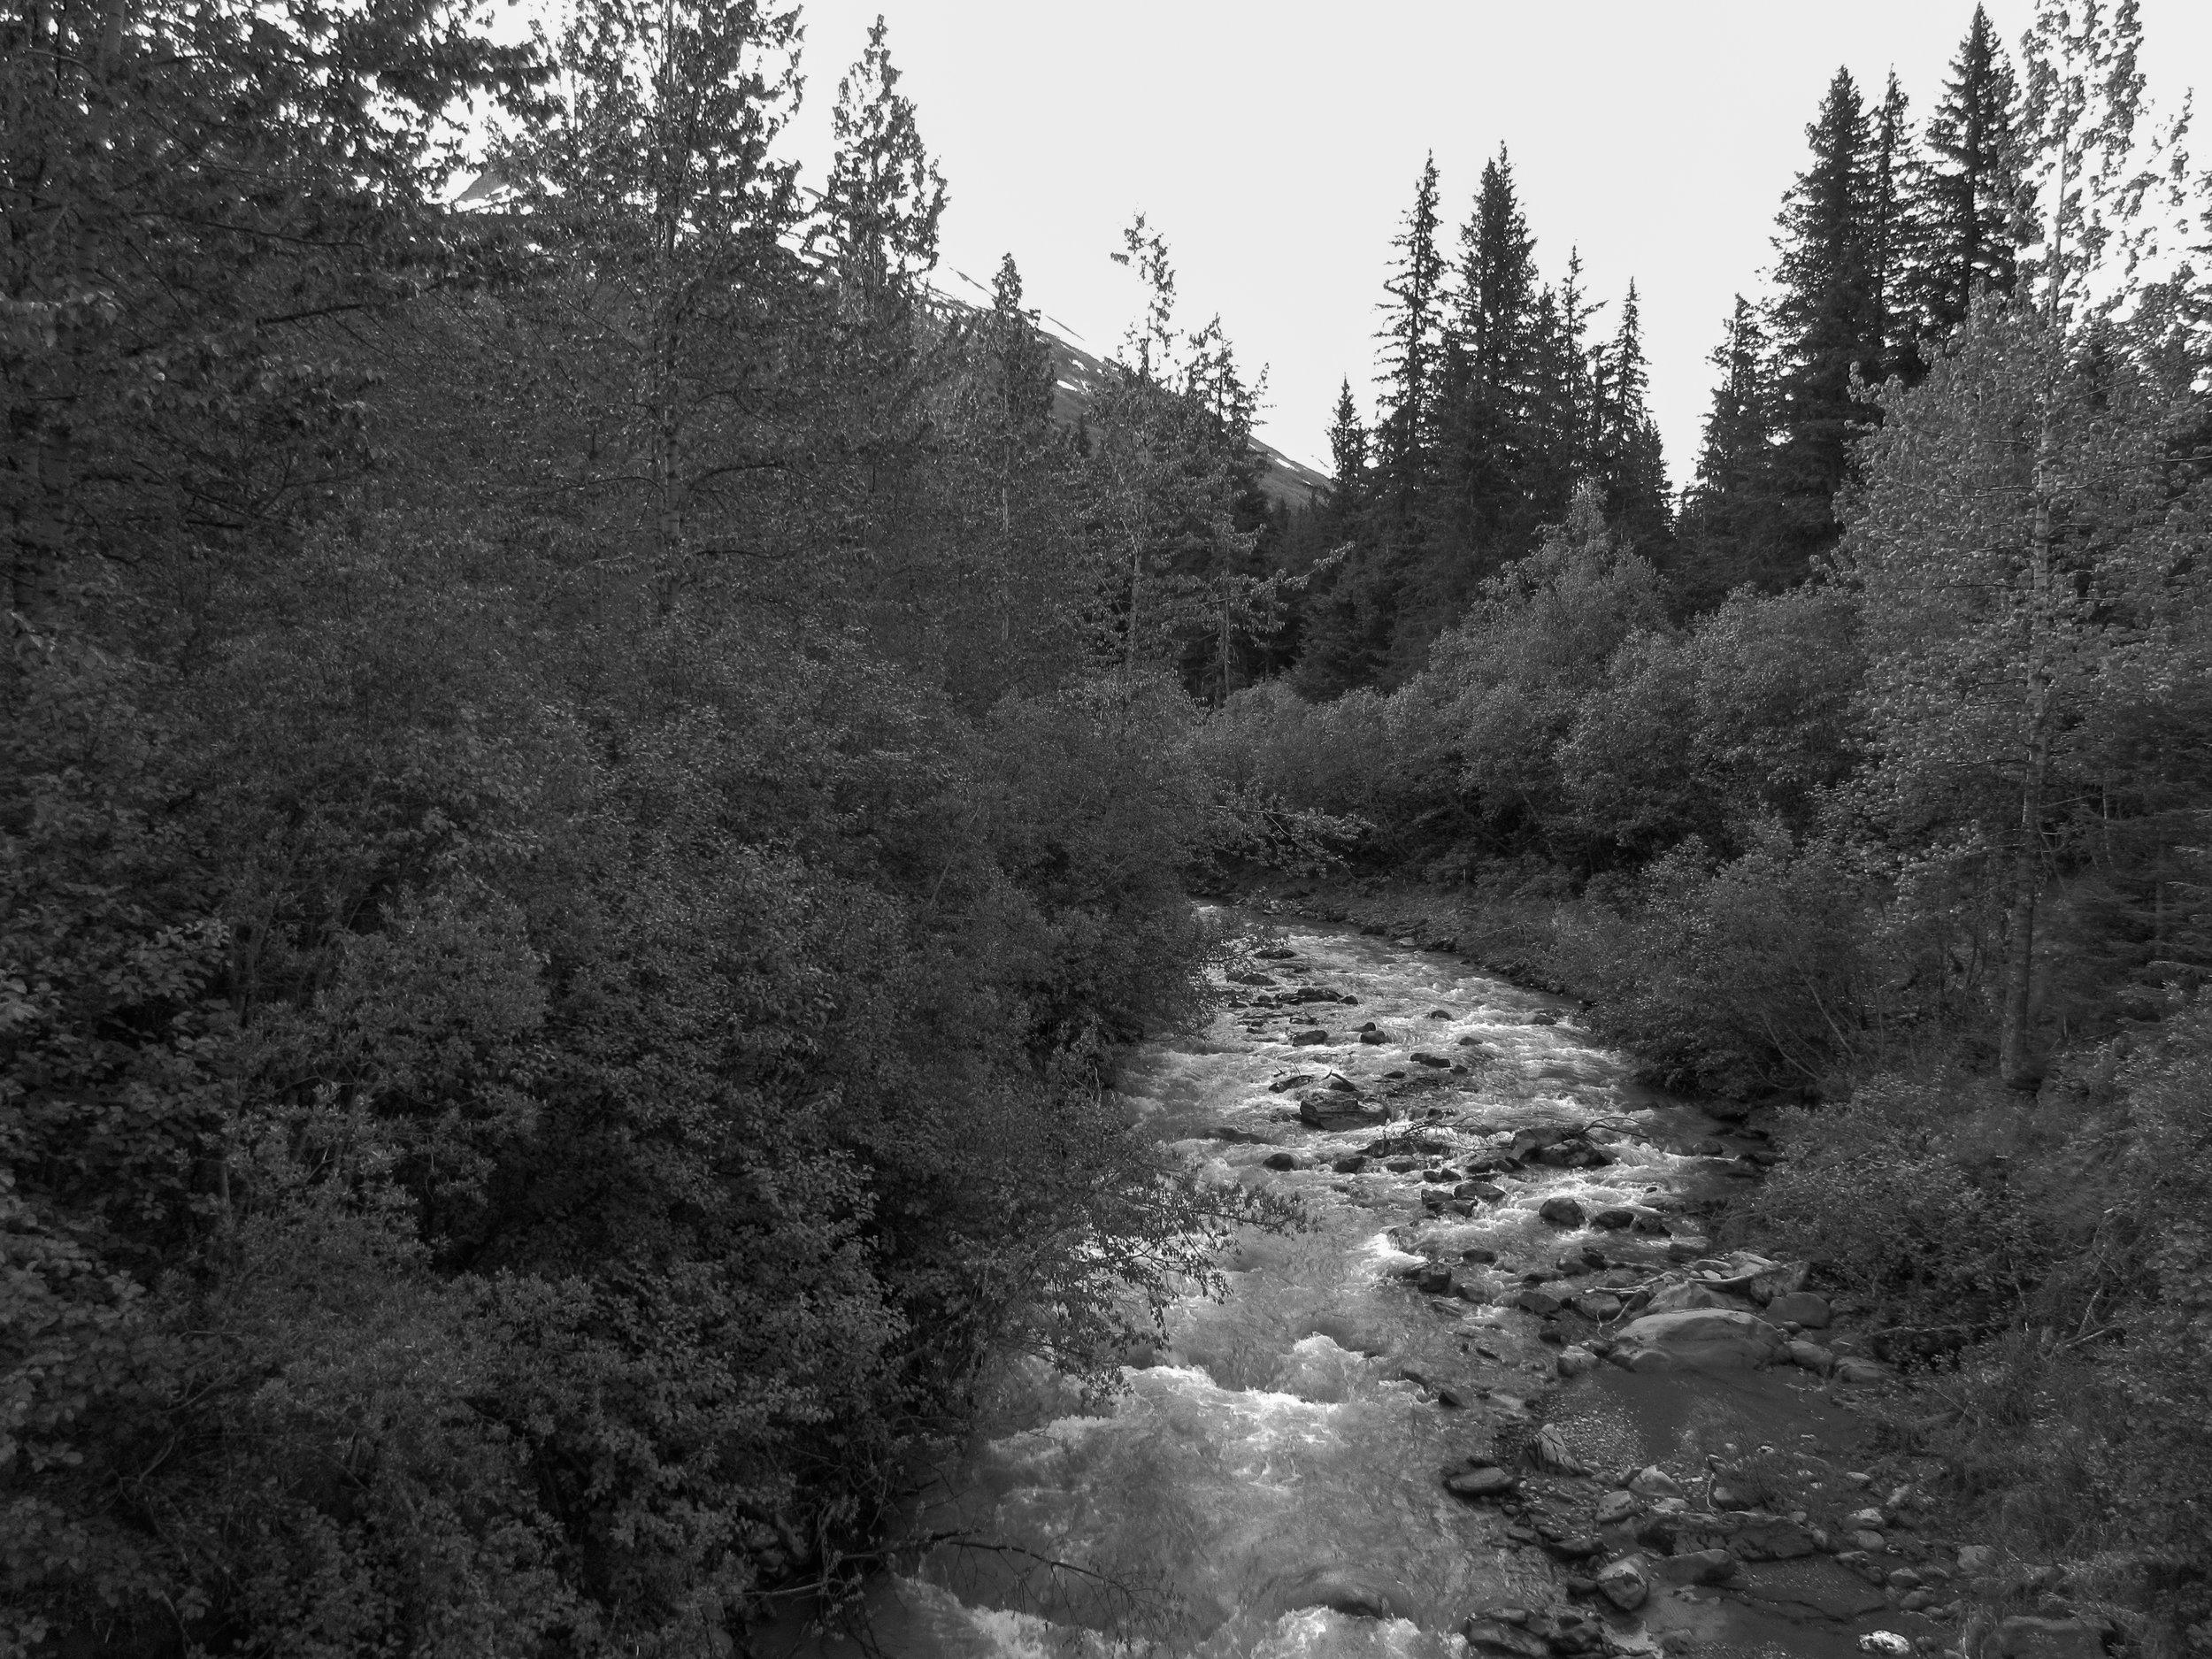 Chugach National Forest, Alaska